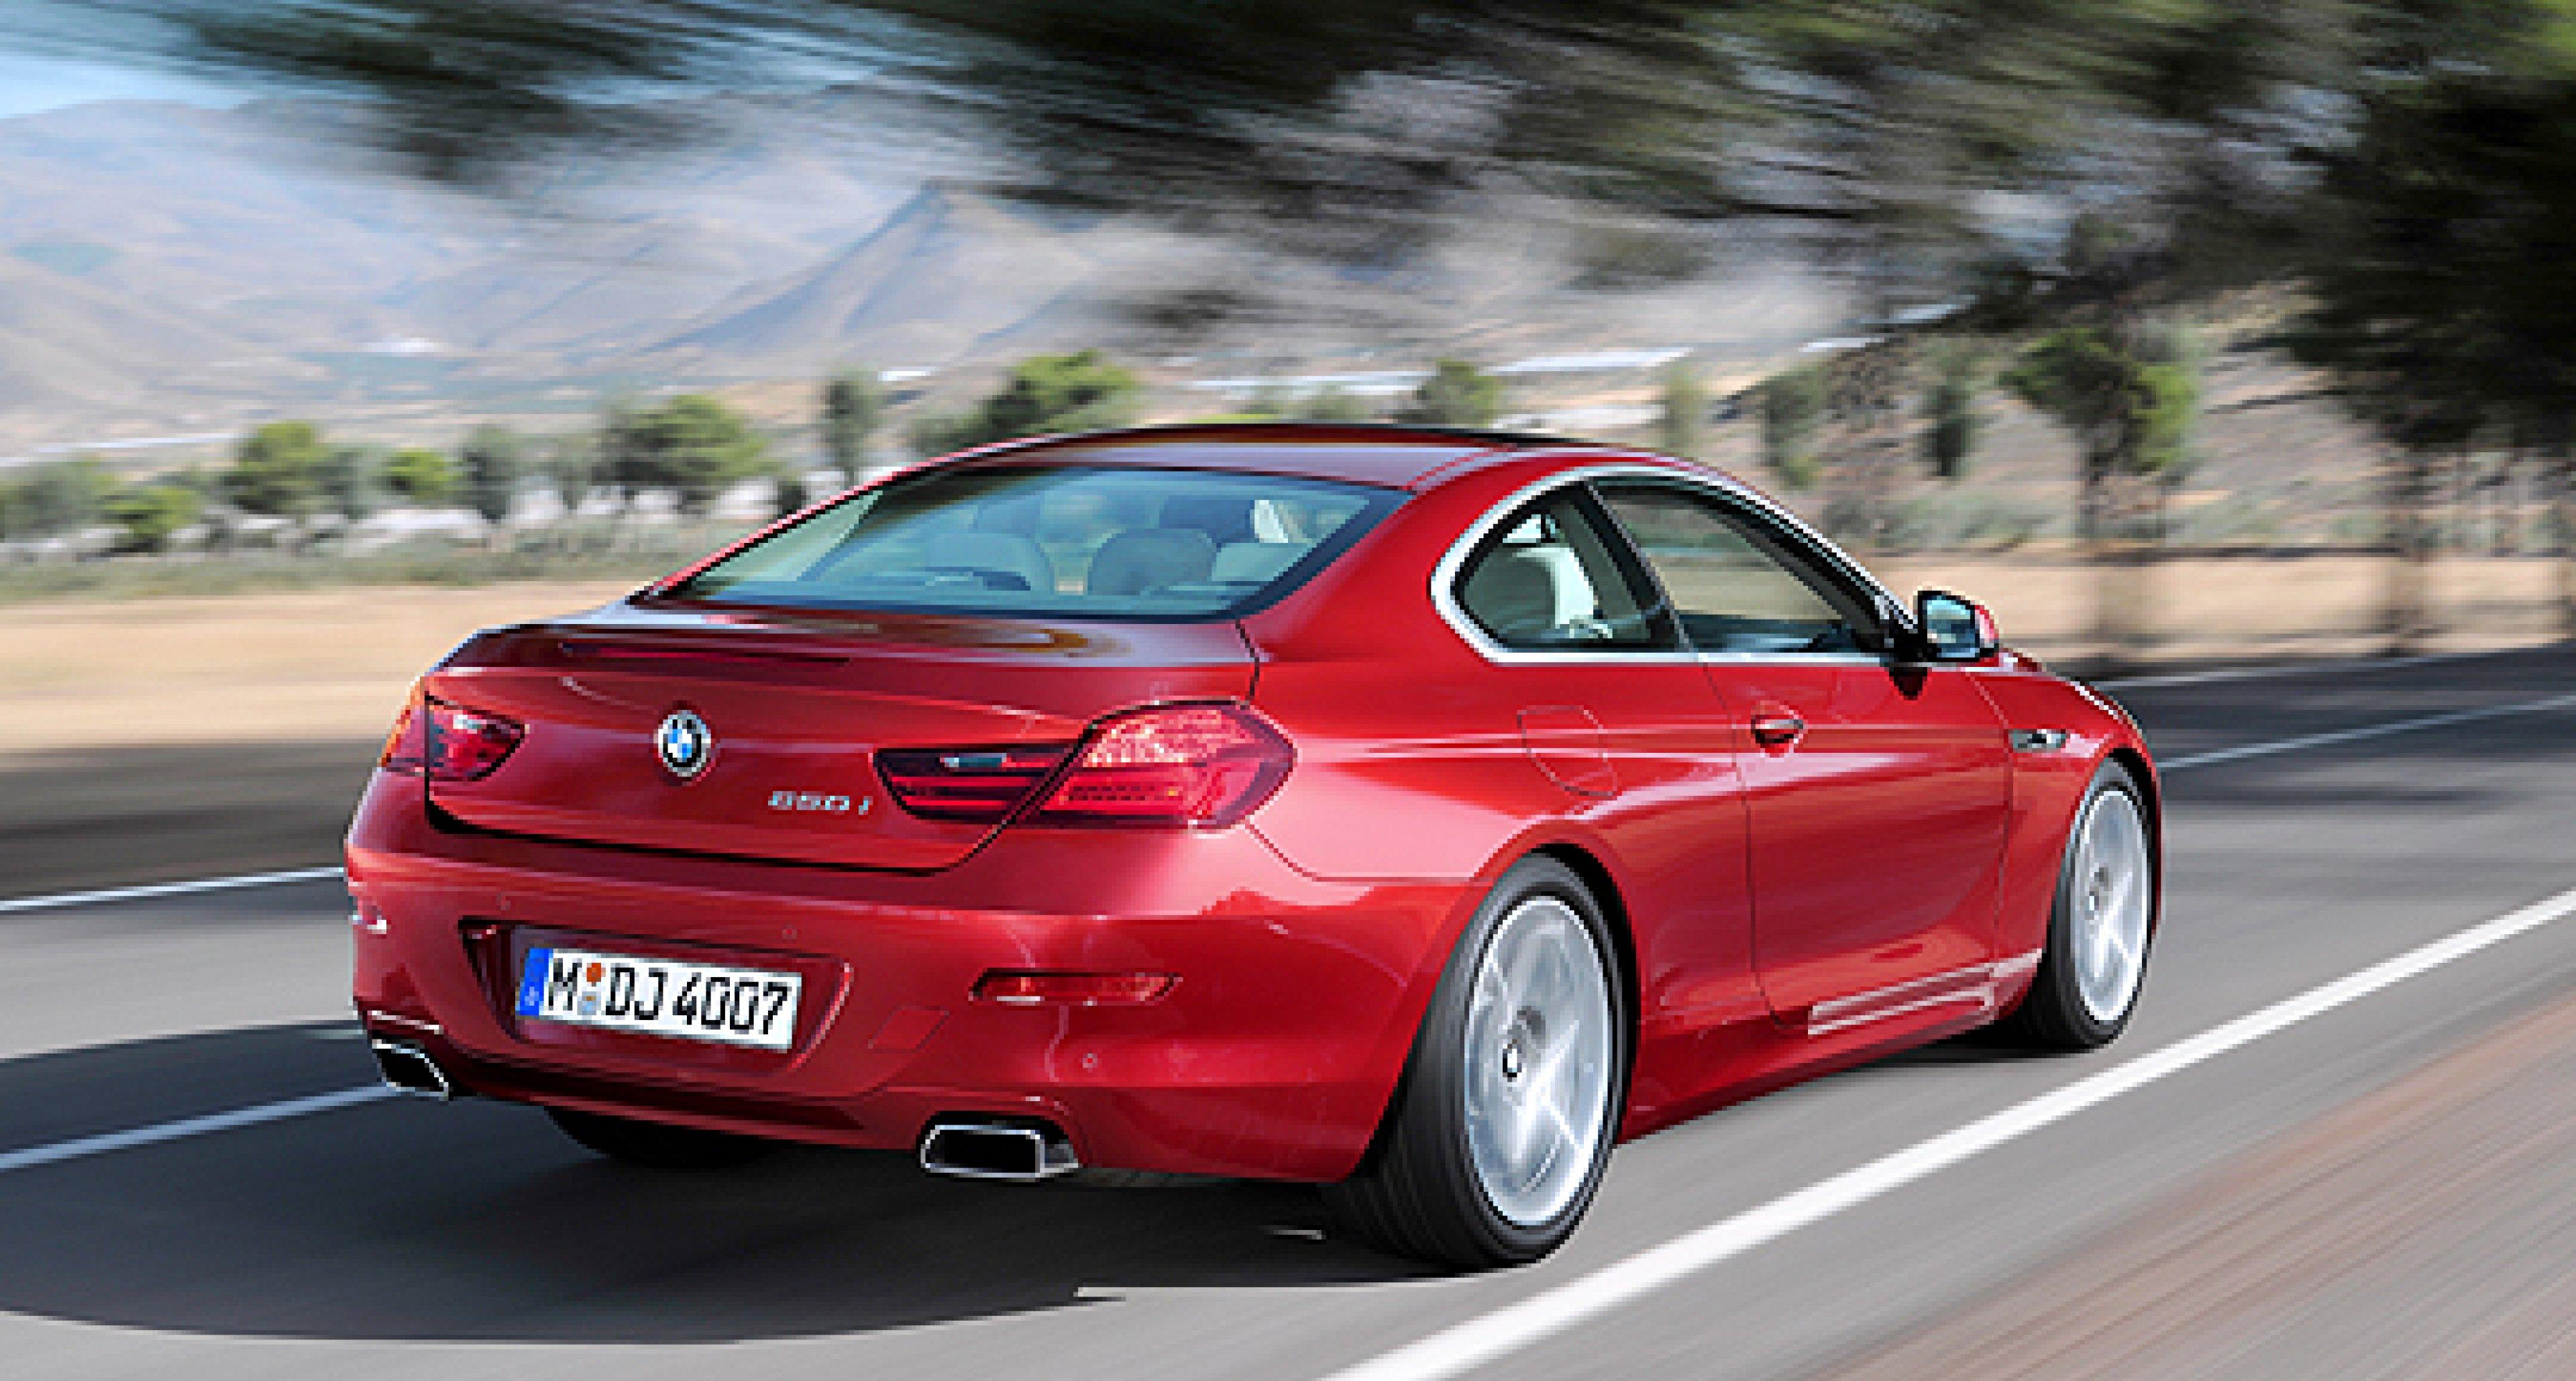 New BMW 6 Series Coupé